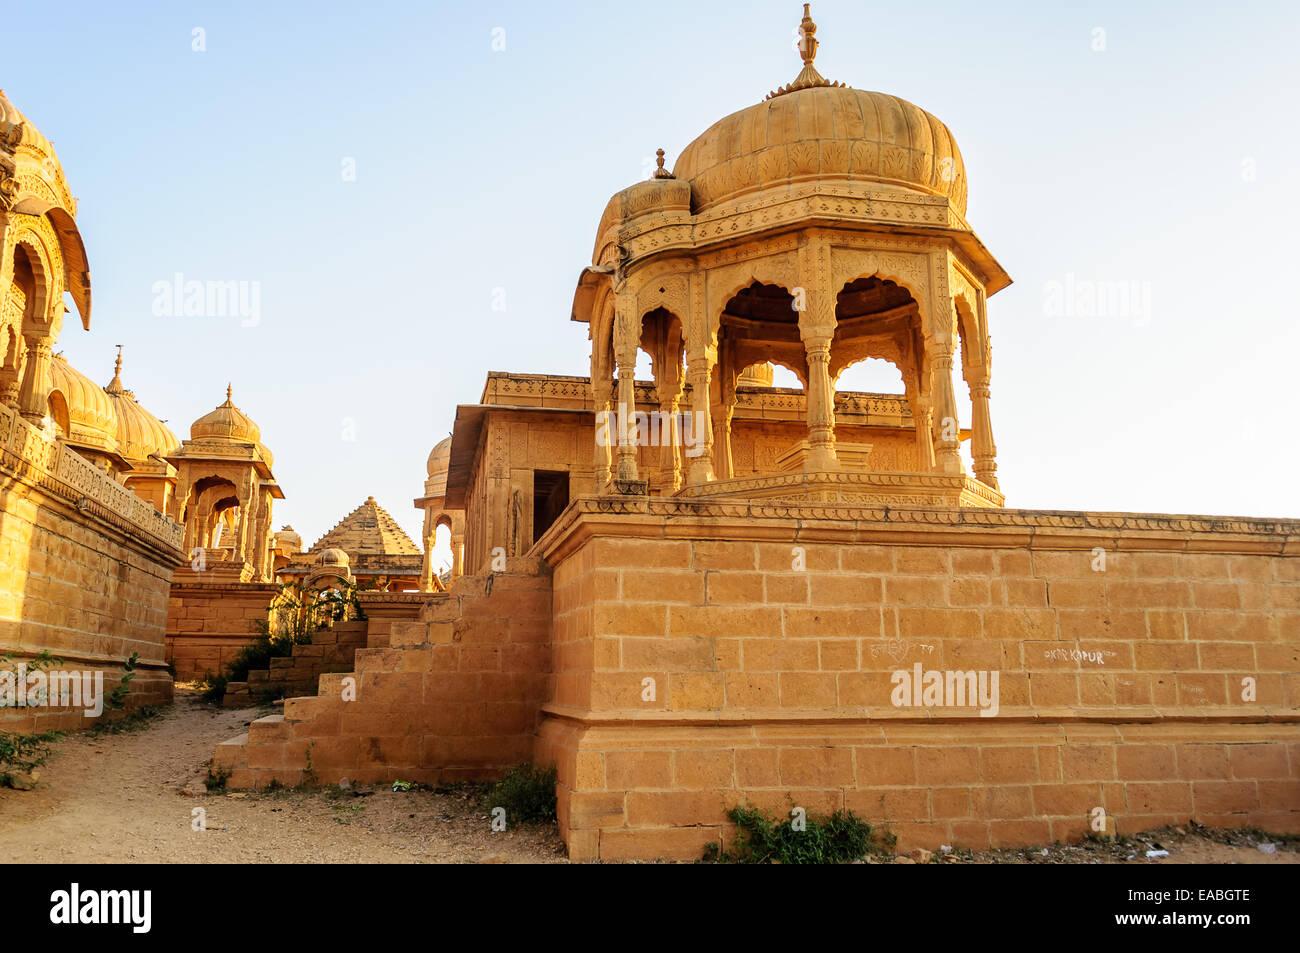 Cenotaphs of Bada Bagh, King's memorials, Jaisalmer, Rajasthan - Stock Image